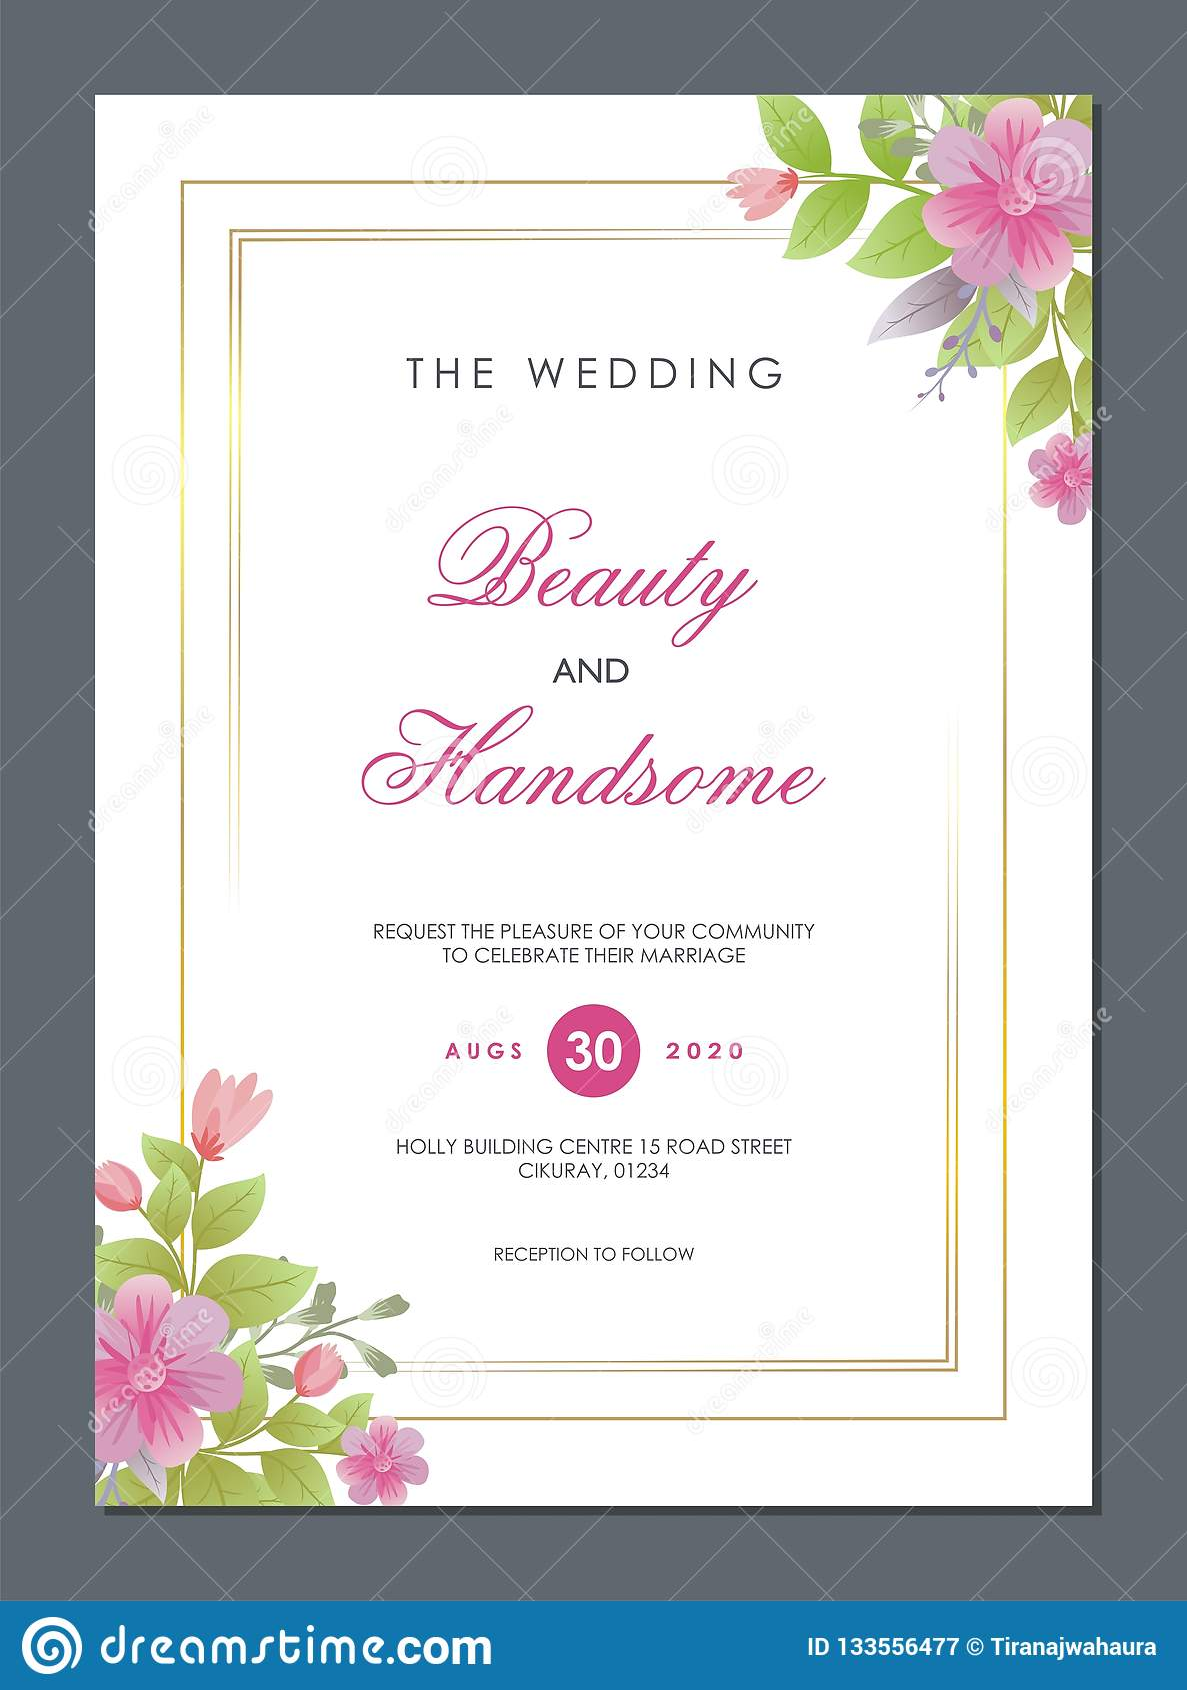 https www dreamstime com wedding invitation card golden lineal guilloche floral ornaments bouquets trendy simple elegant interesting designs image133556477